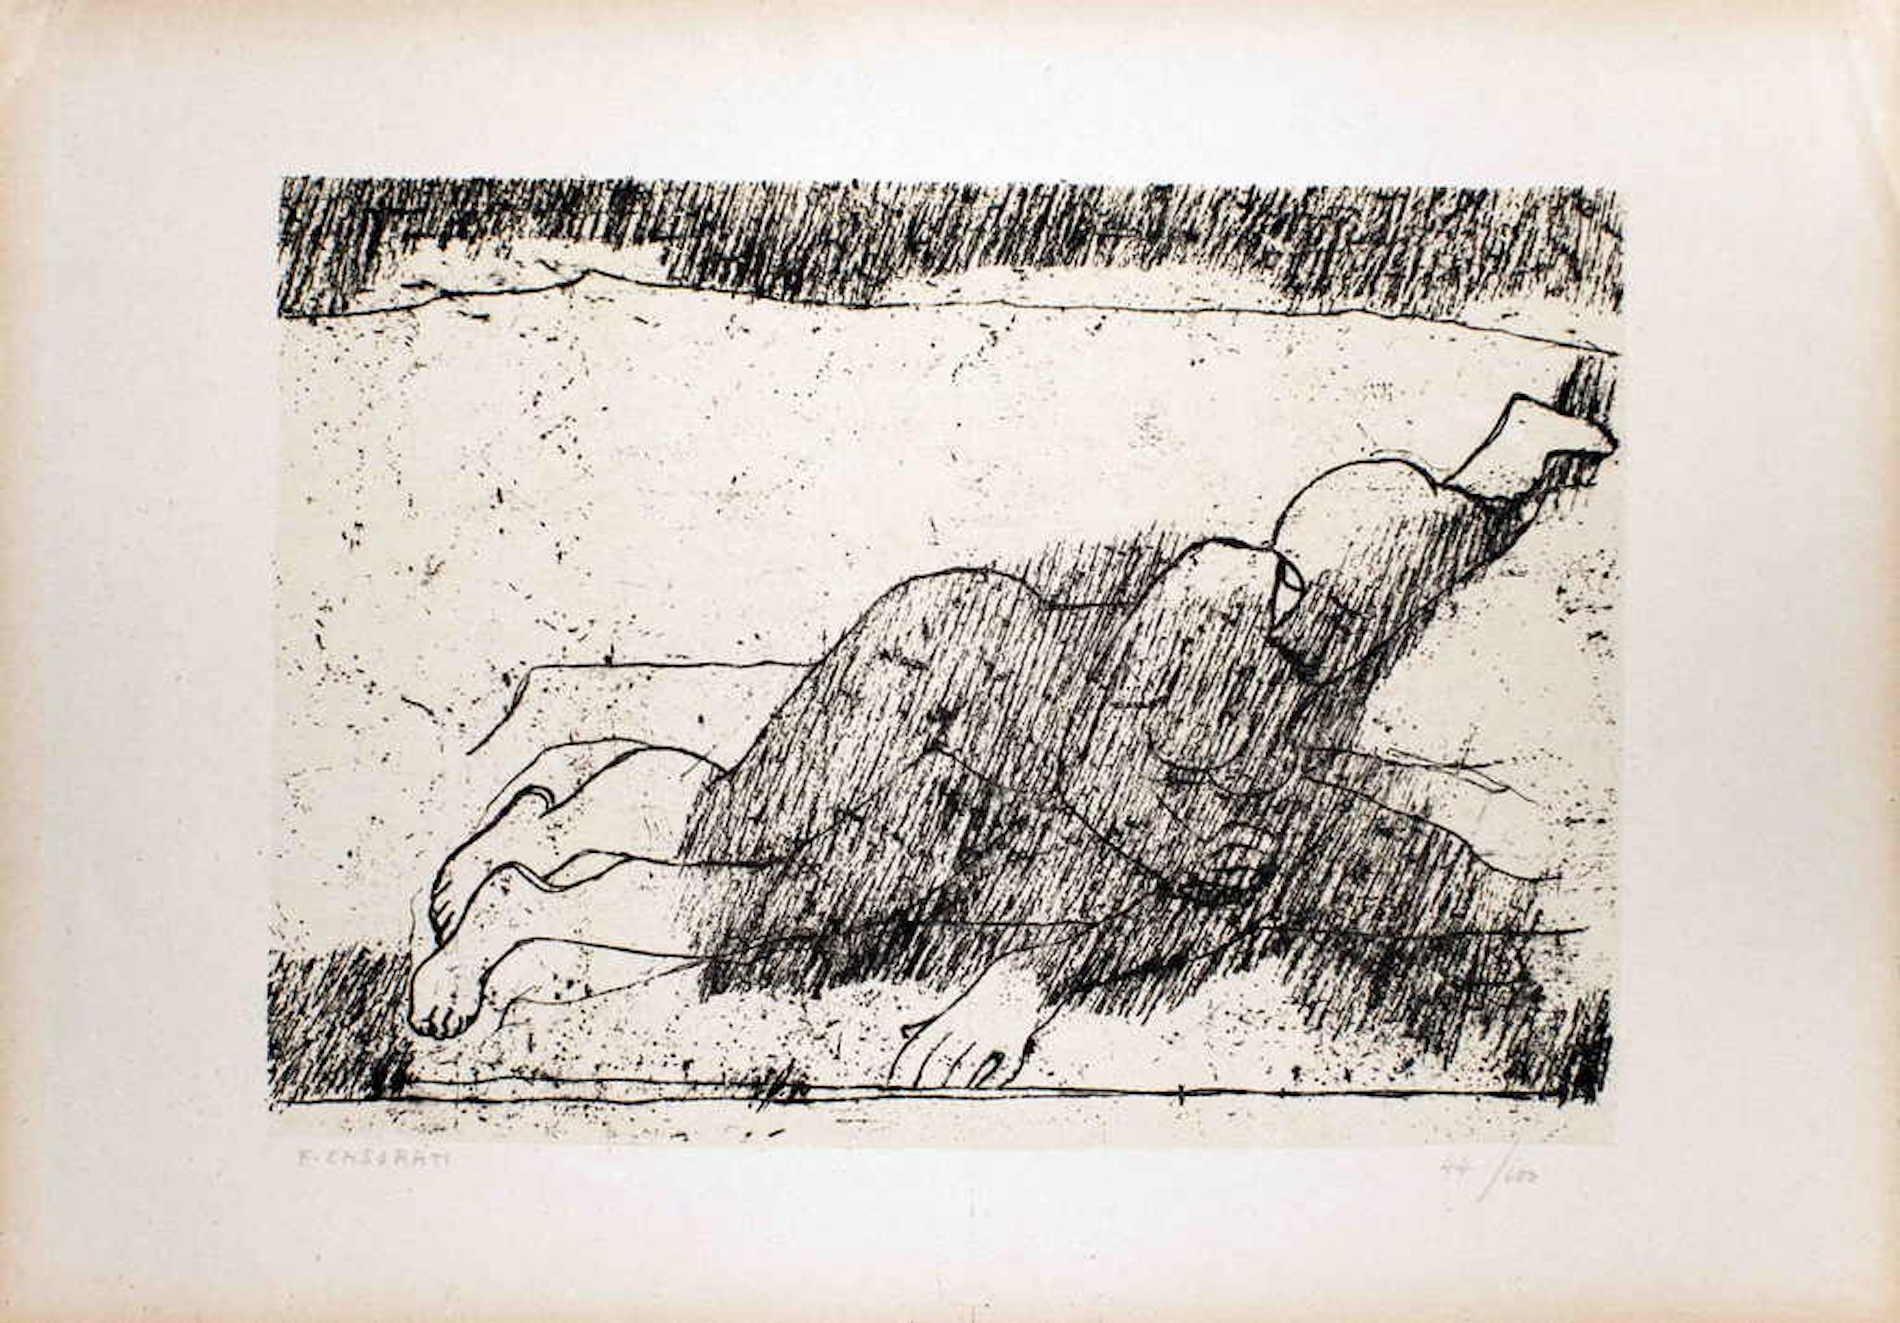 Lying Nude - Original Lithograph by Felice Casorati - 1946